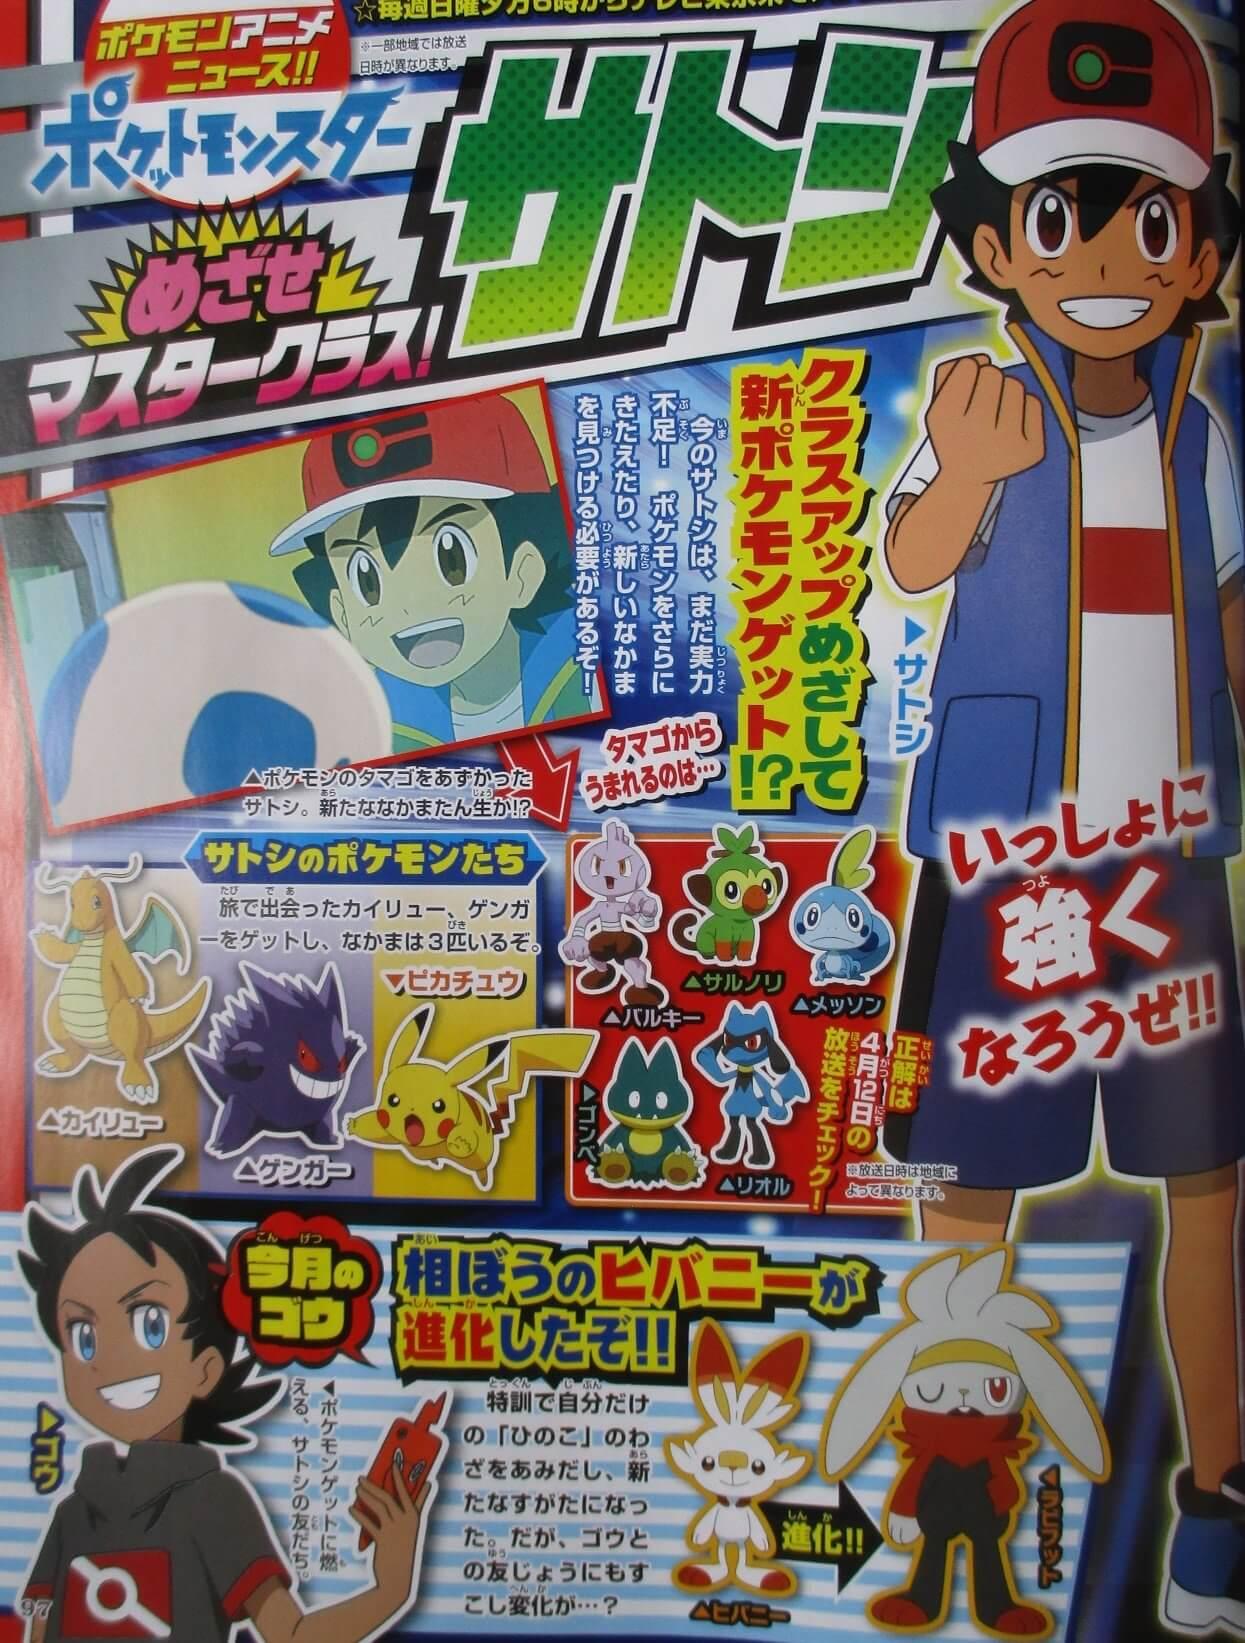 Ash obtendrá un Huevo Pokémon en el nuevo anime de Pokémon 2020